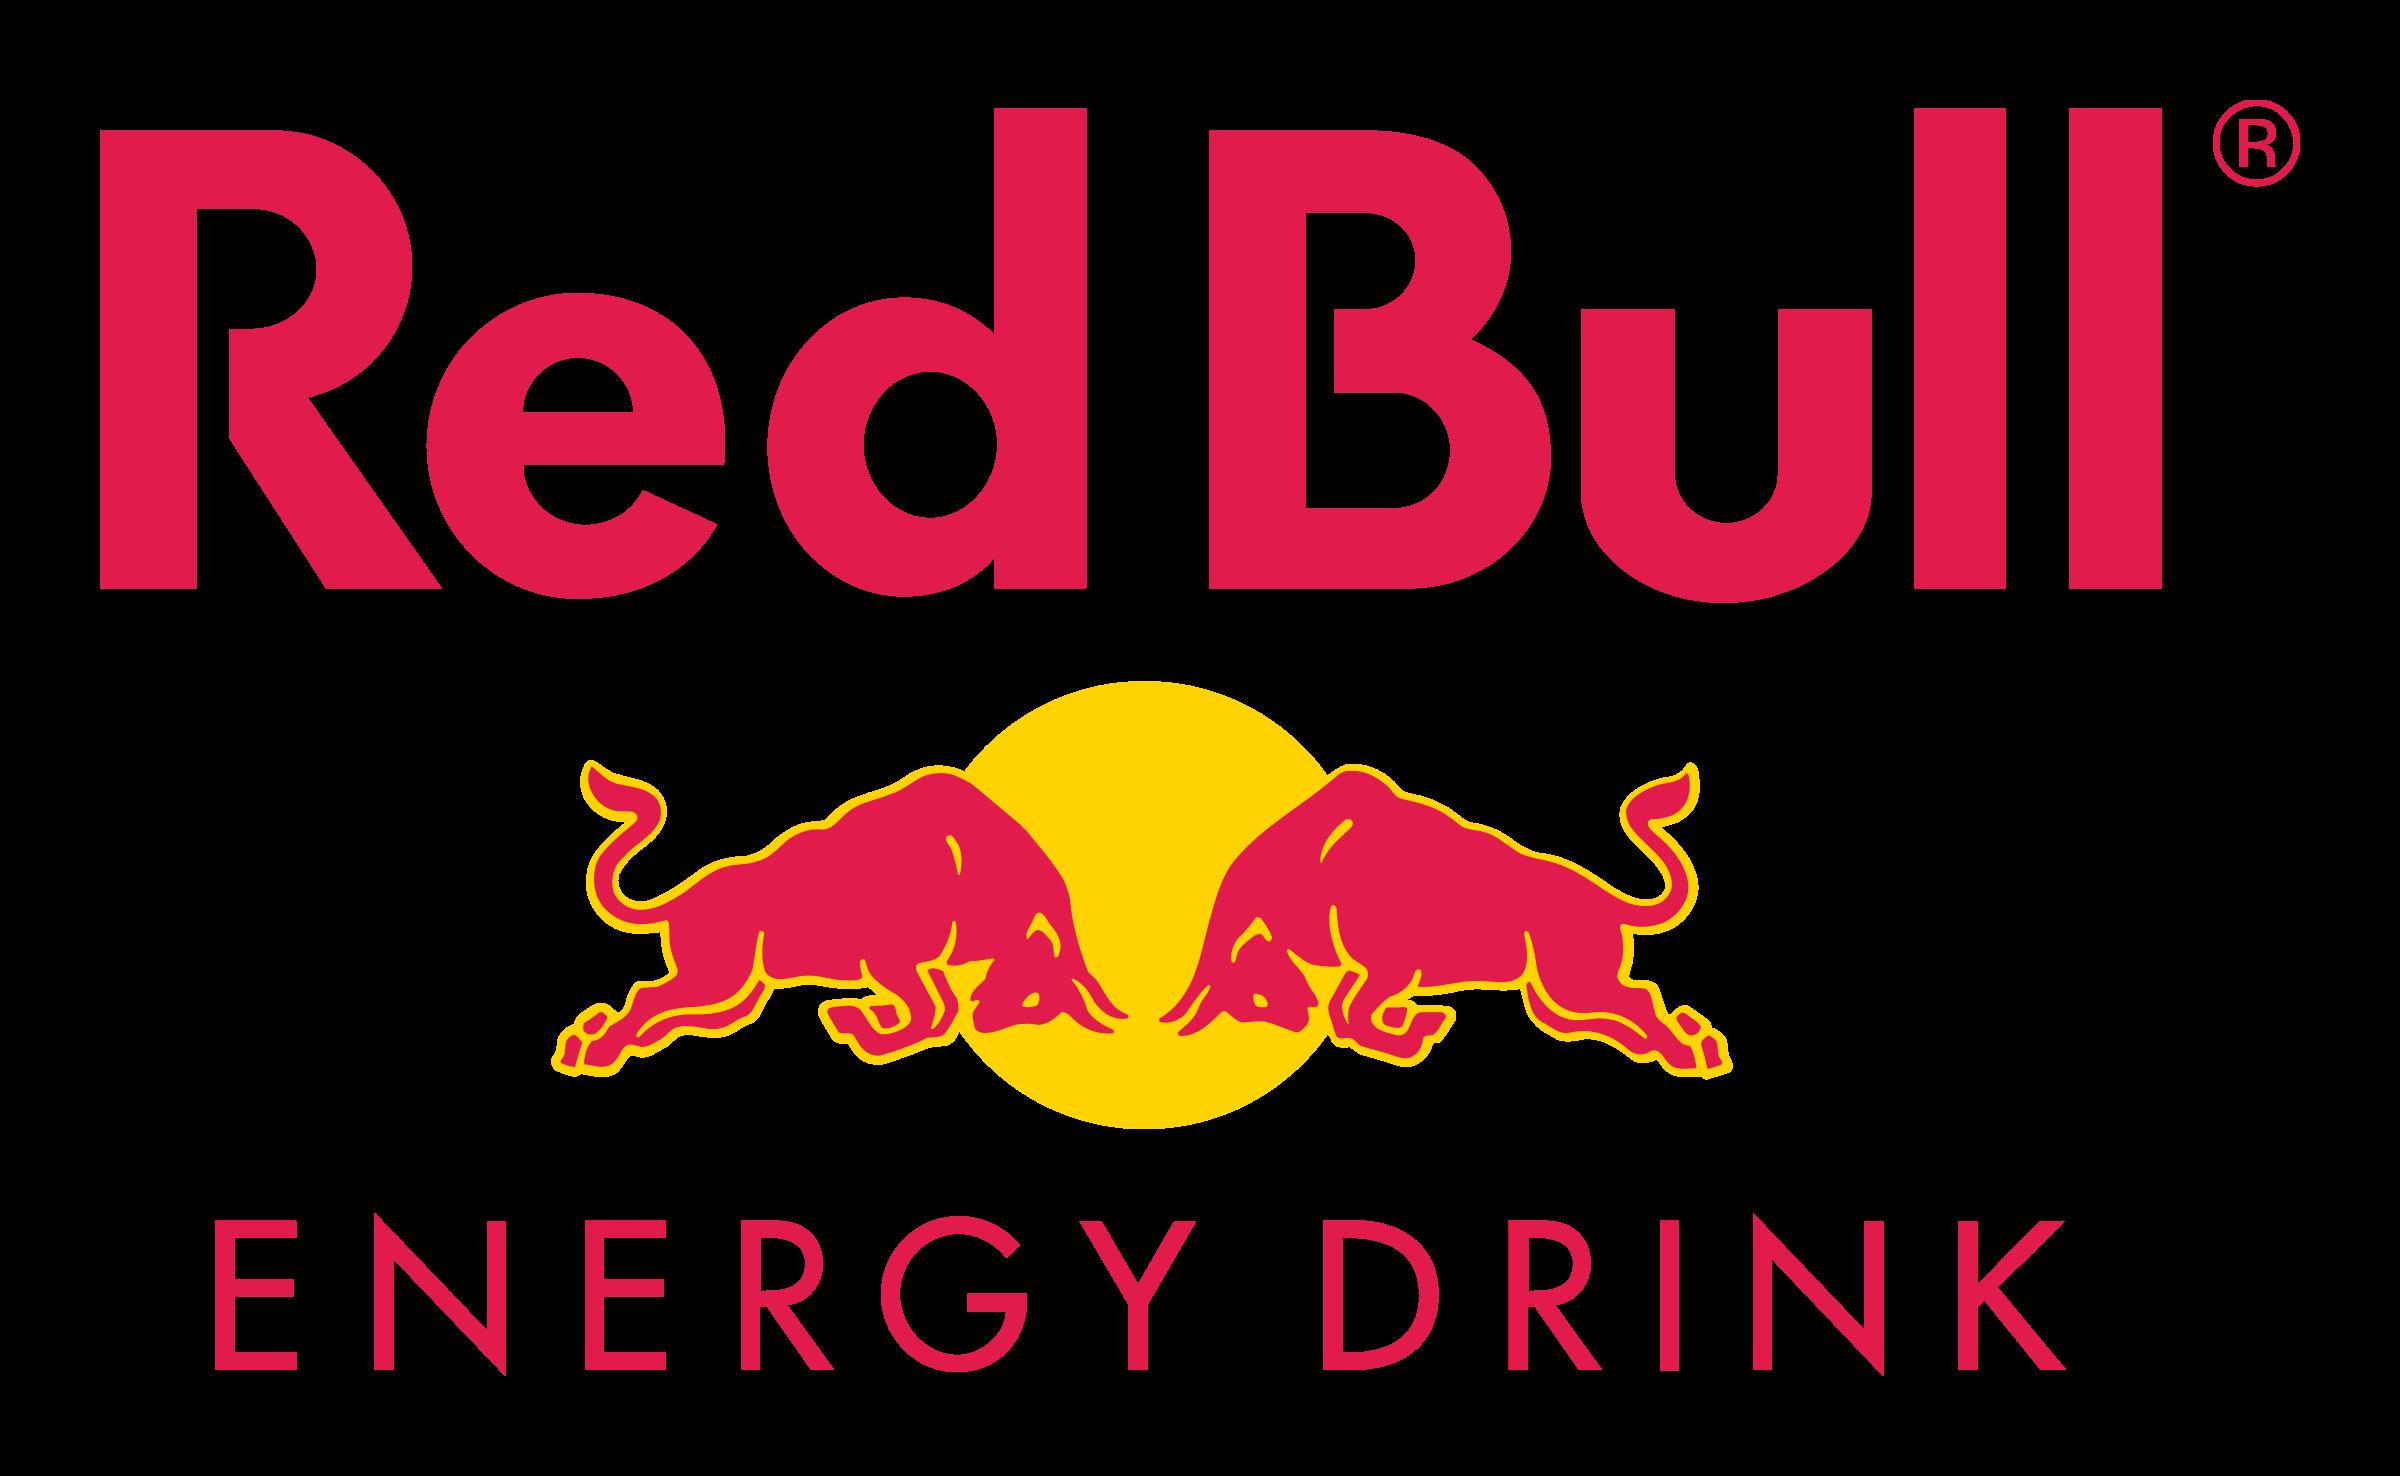 Red Bull Logo PNG Transparent & SVG Vector.